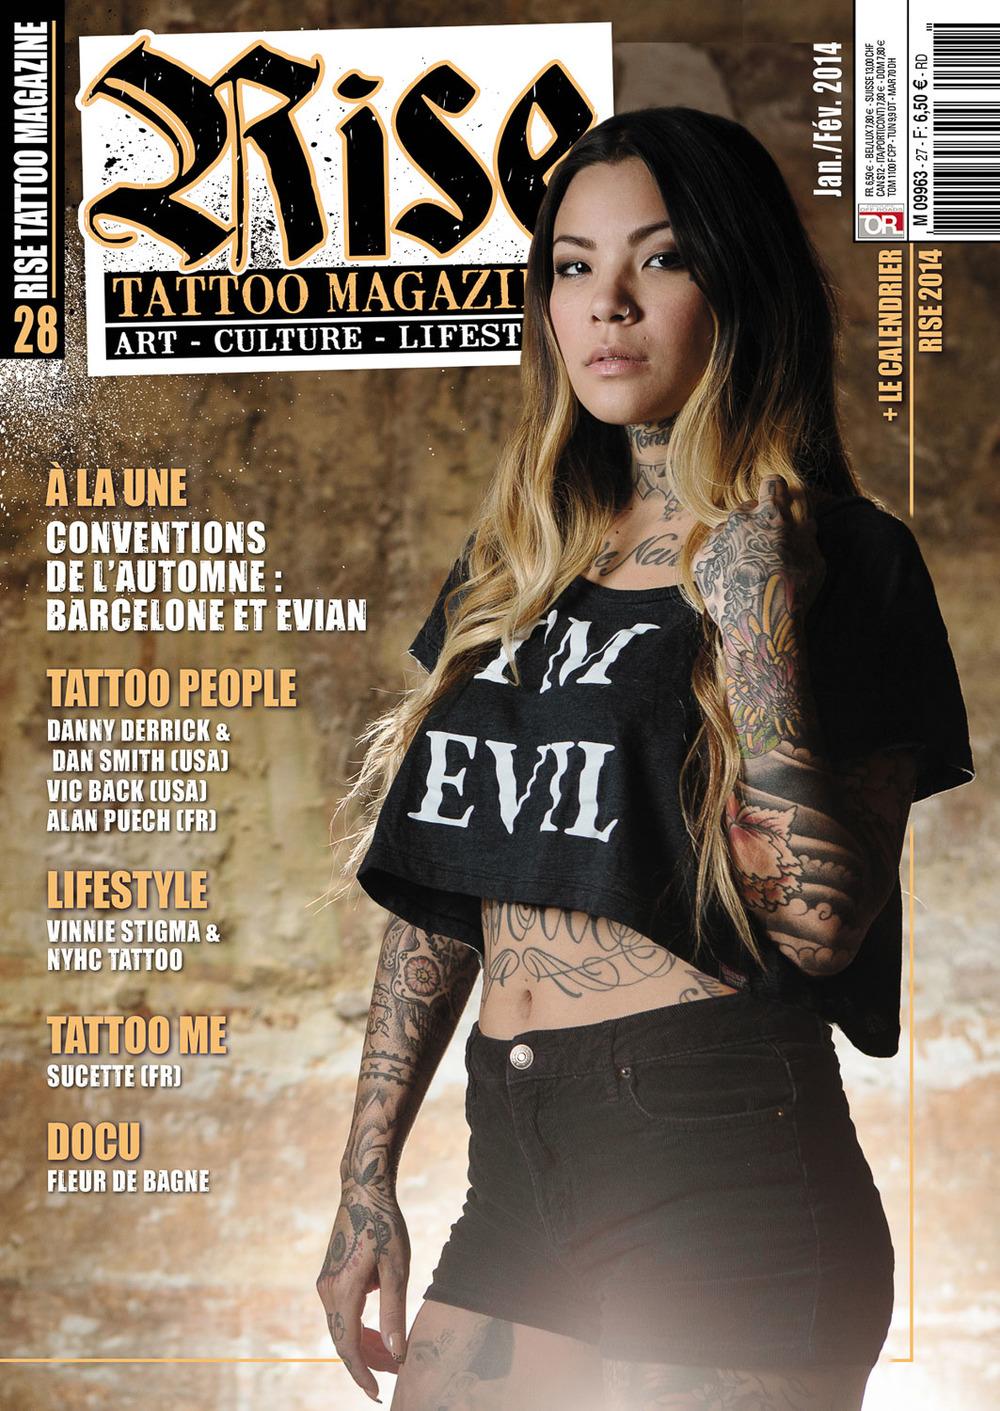 Rise Tattoo Magazine #28 / Cover